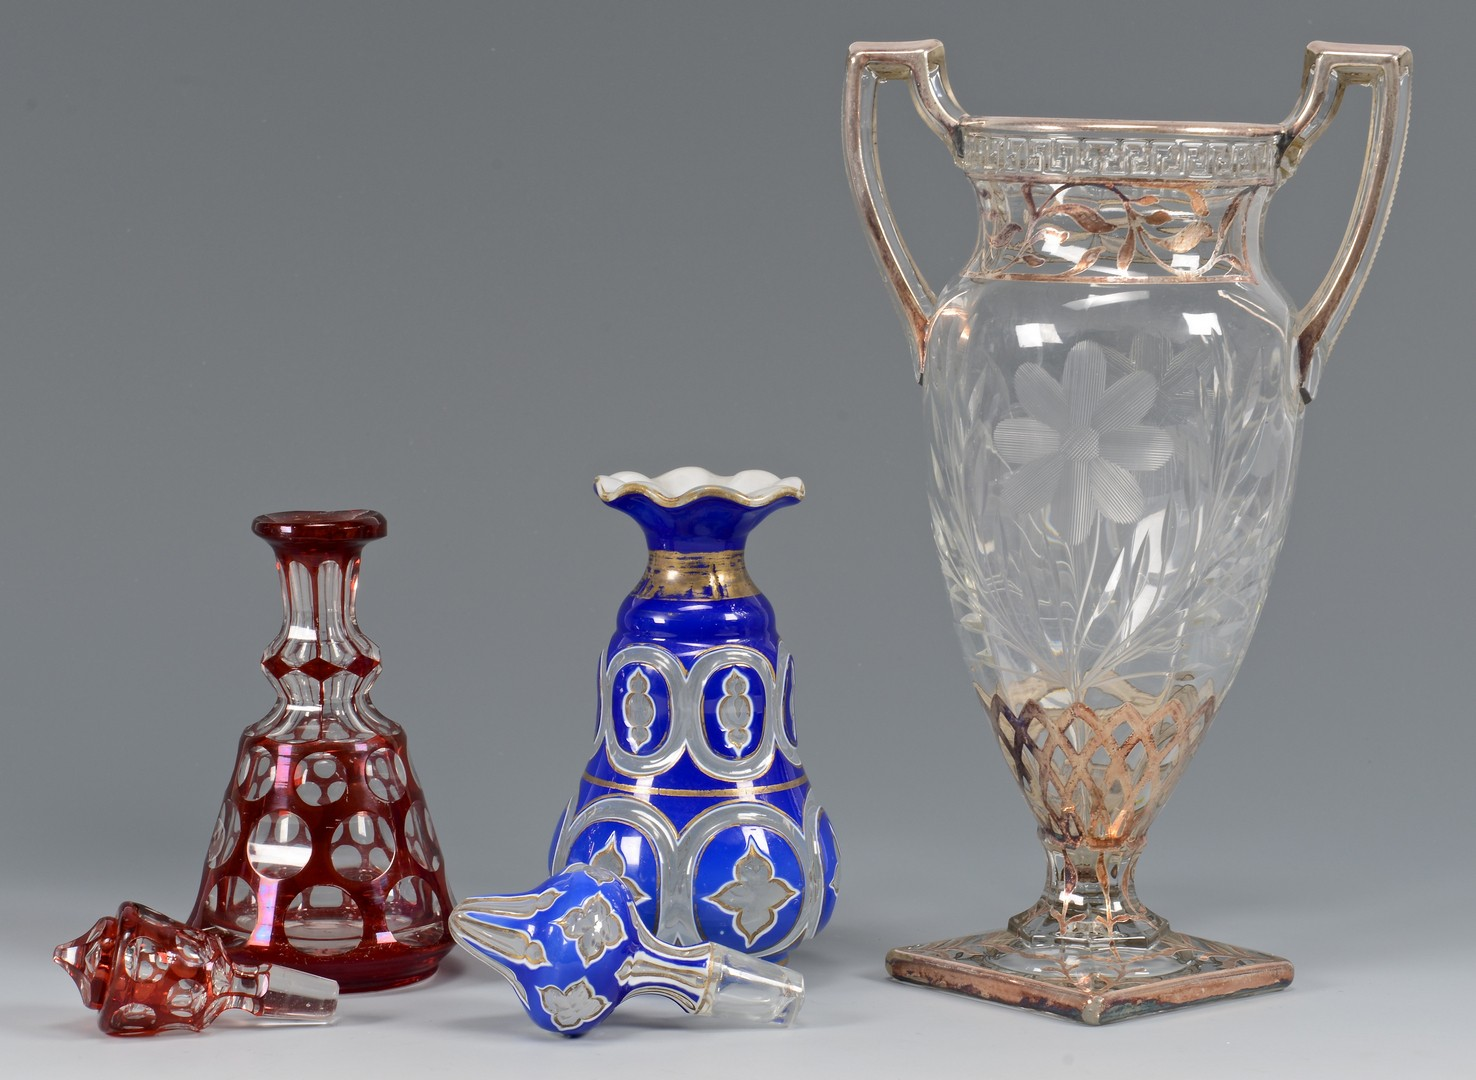 Lot 652: 5 Pcs Glass: Perfume Bottles, Vase, Candlesticks